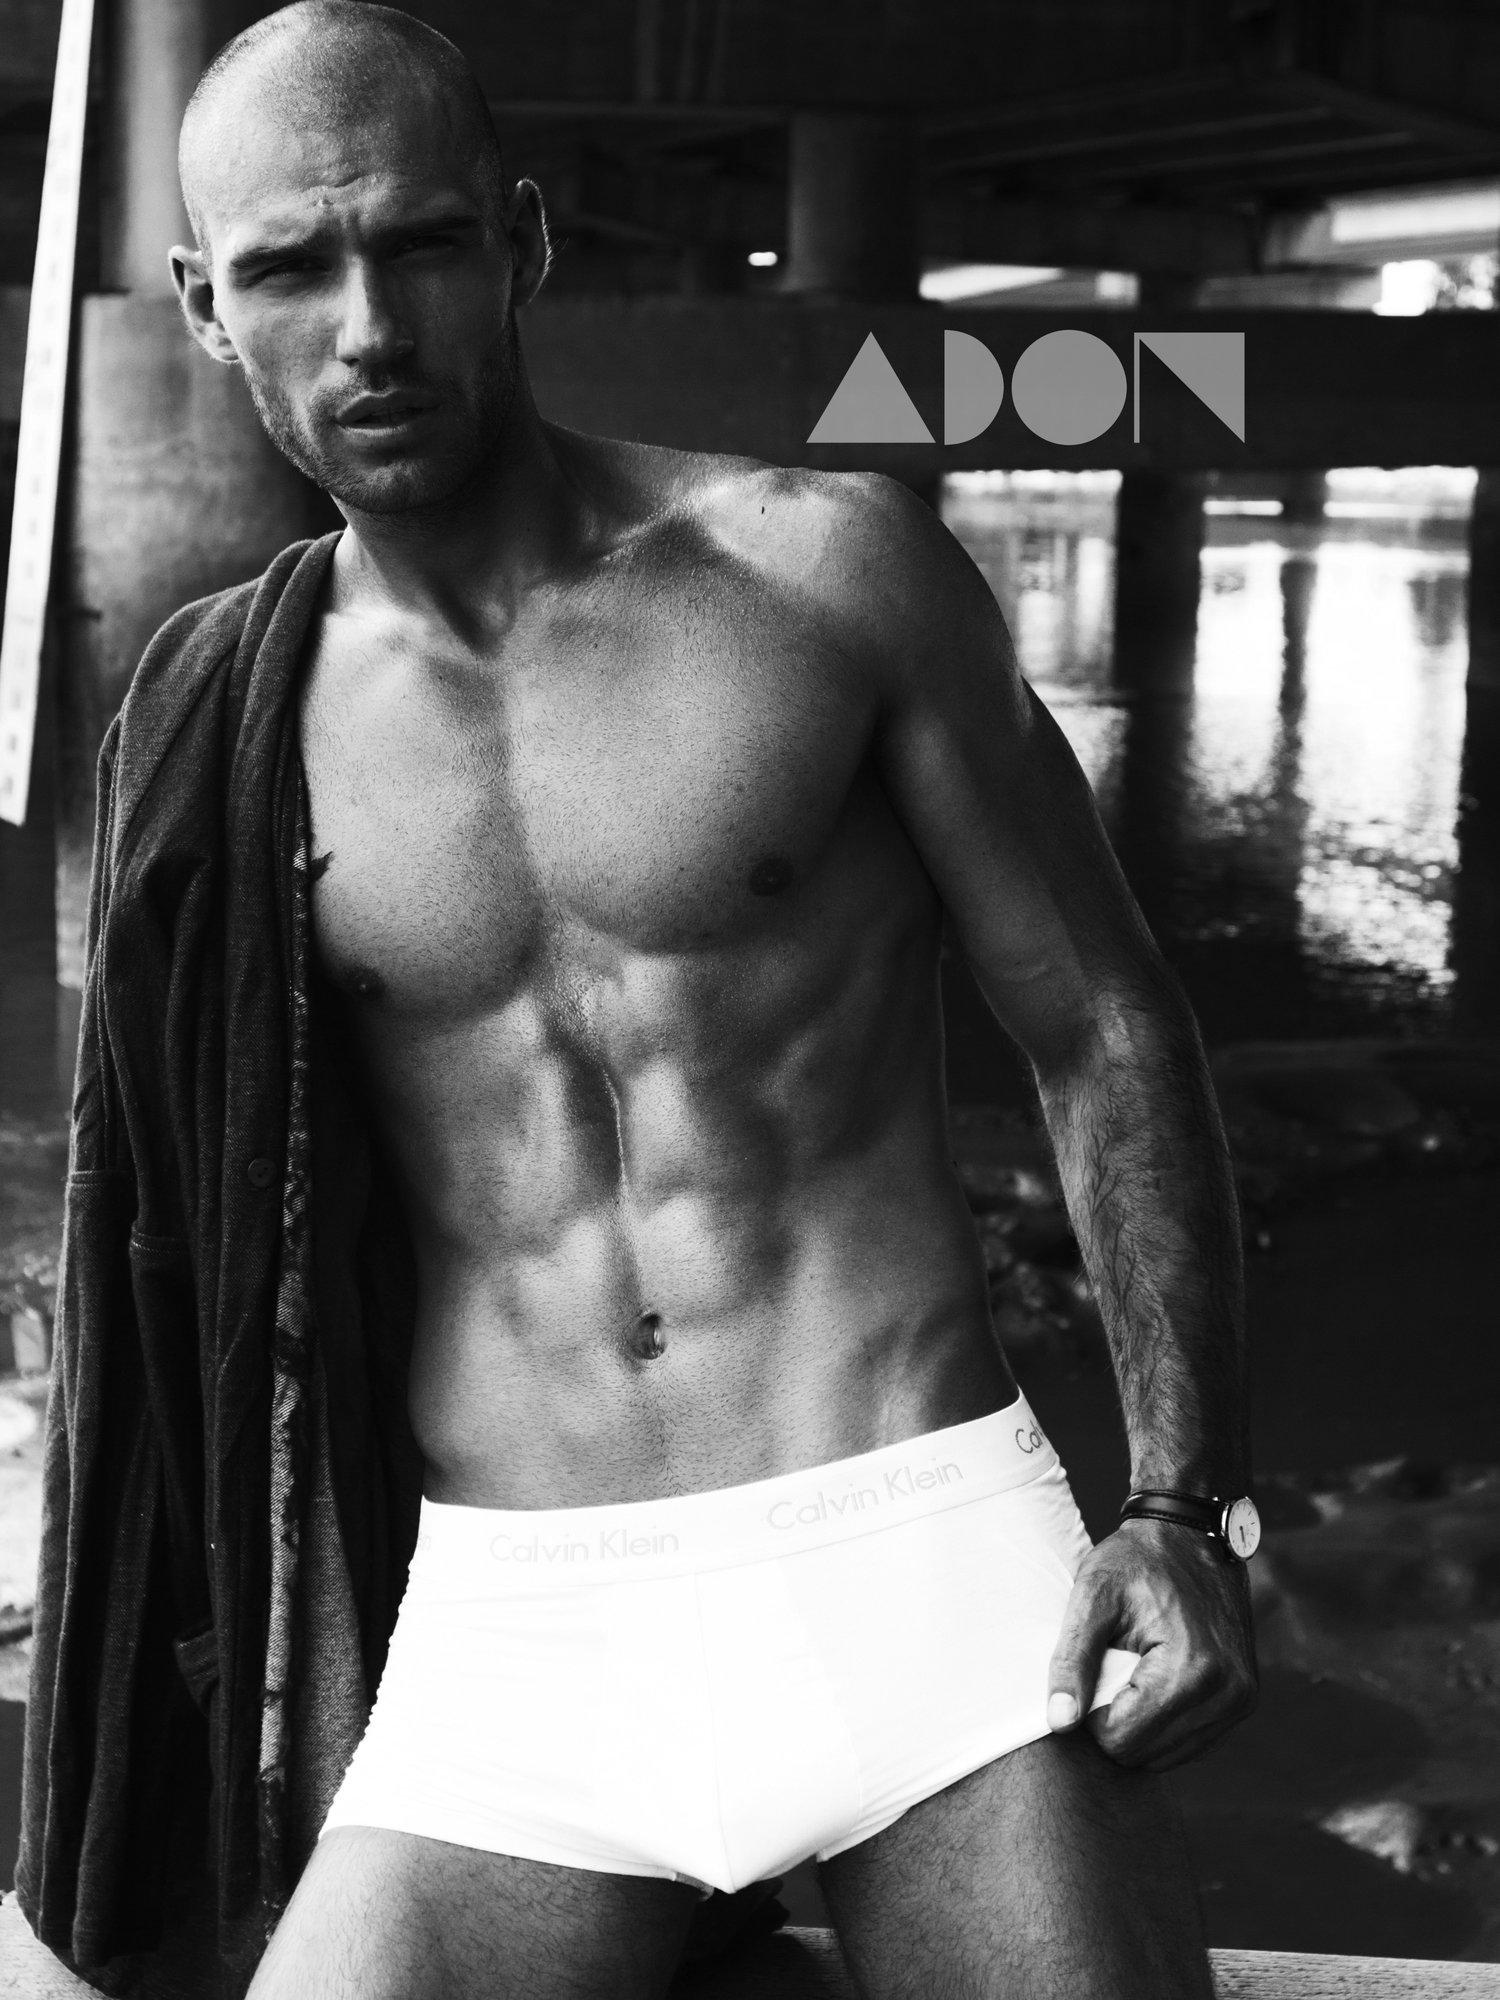 Adon Exclusive: Model Roma Korkodola By Danil Kotenko